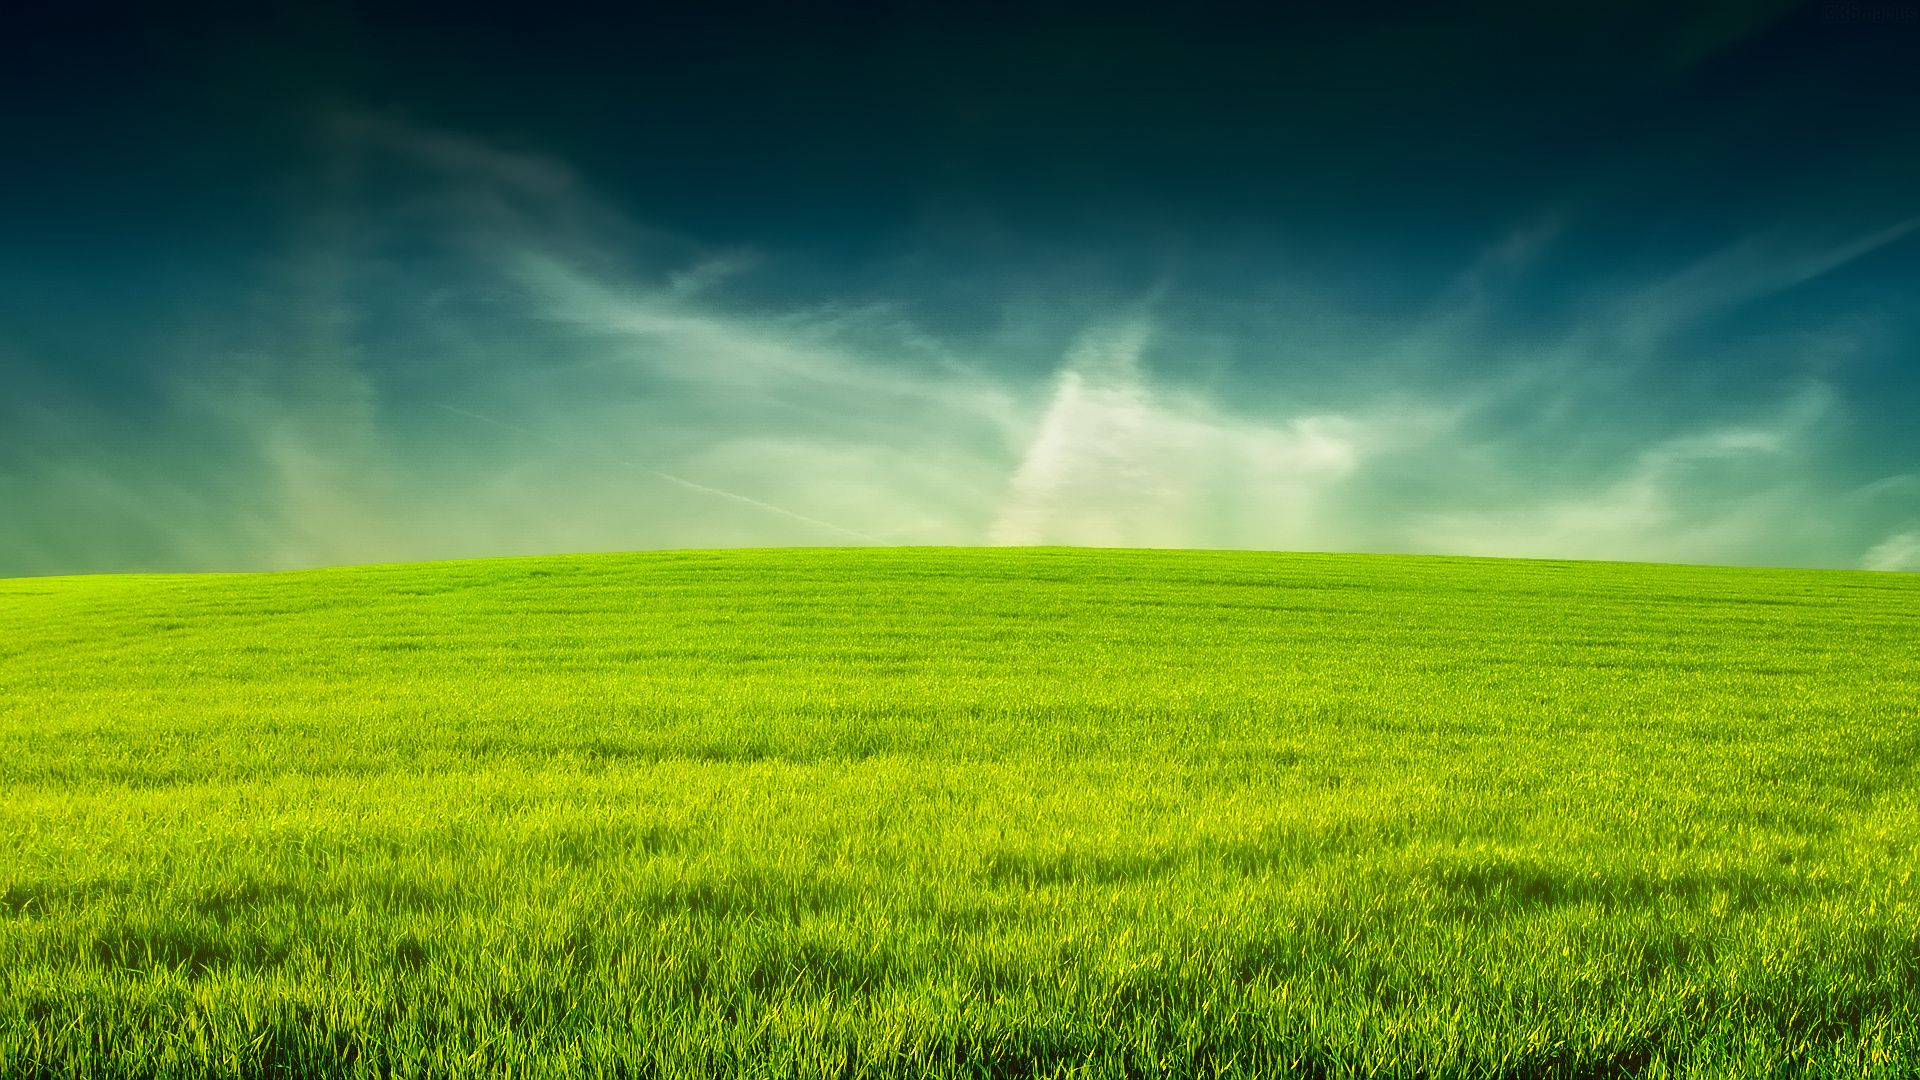 cdc95e0e9bc Descargar gratis campo, Verde, hierba Fondos de escritorio en la resolucin  1920x1080 — imagen №340879